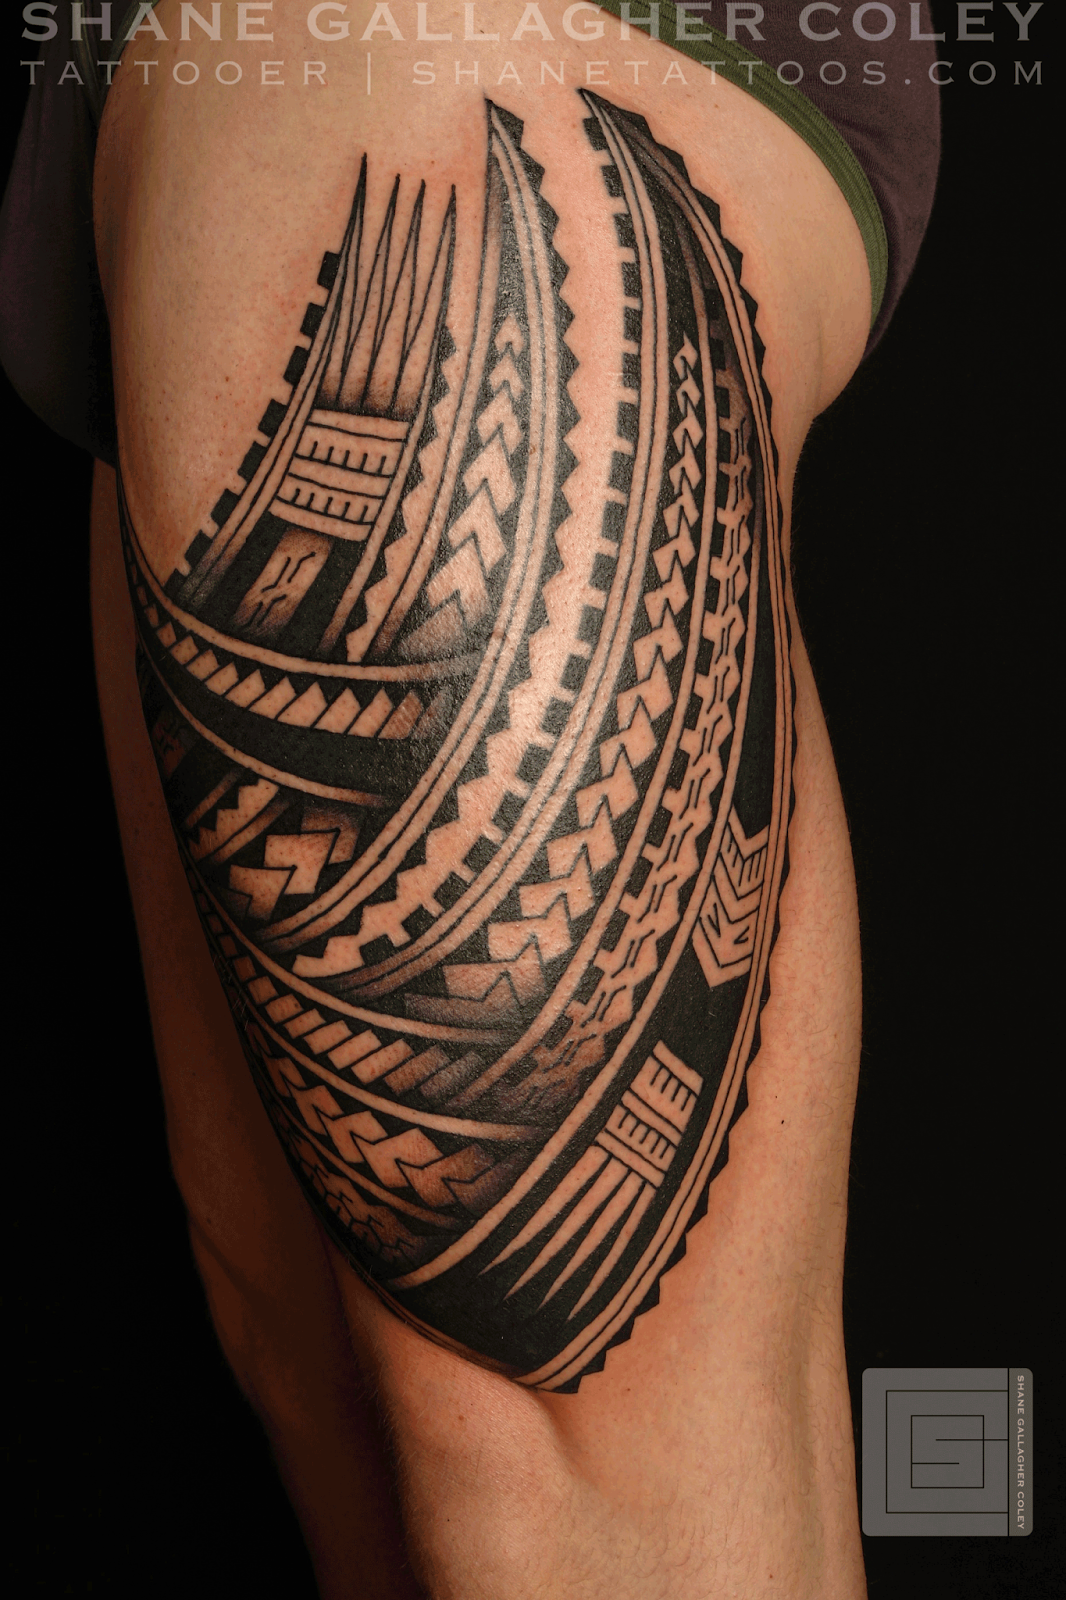 Islander Tattoo Designs - Tribal thigh tattoos tribal band tattoo thigh polynesian thigh tatau tattoo